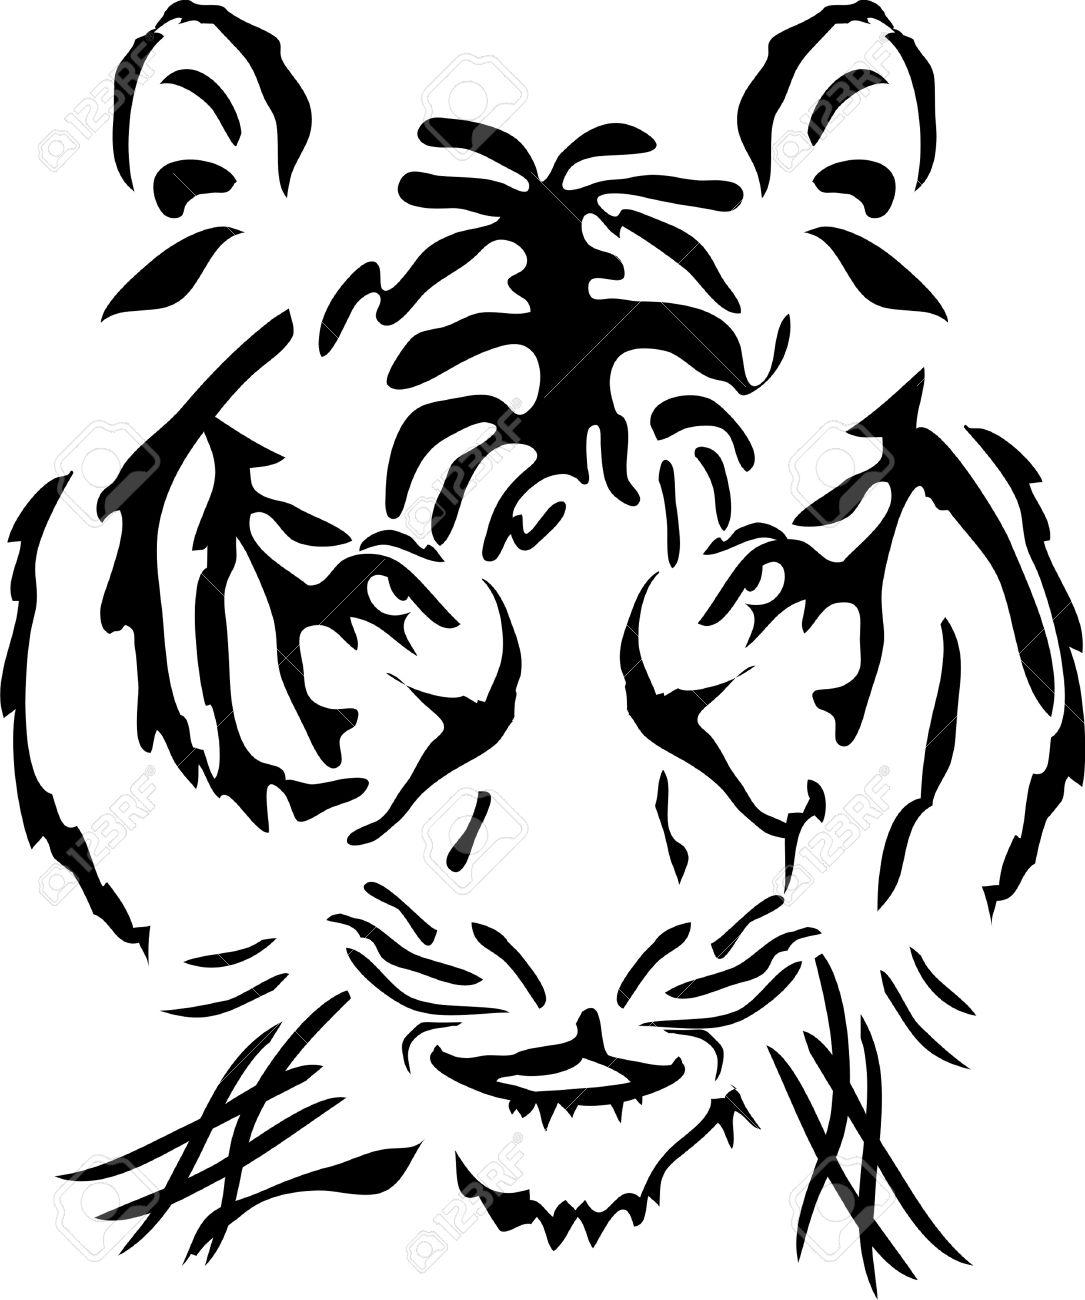 White Tiger clipart bengal tiger ClipartFan Tiger Bengal Black Vector